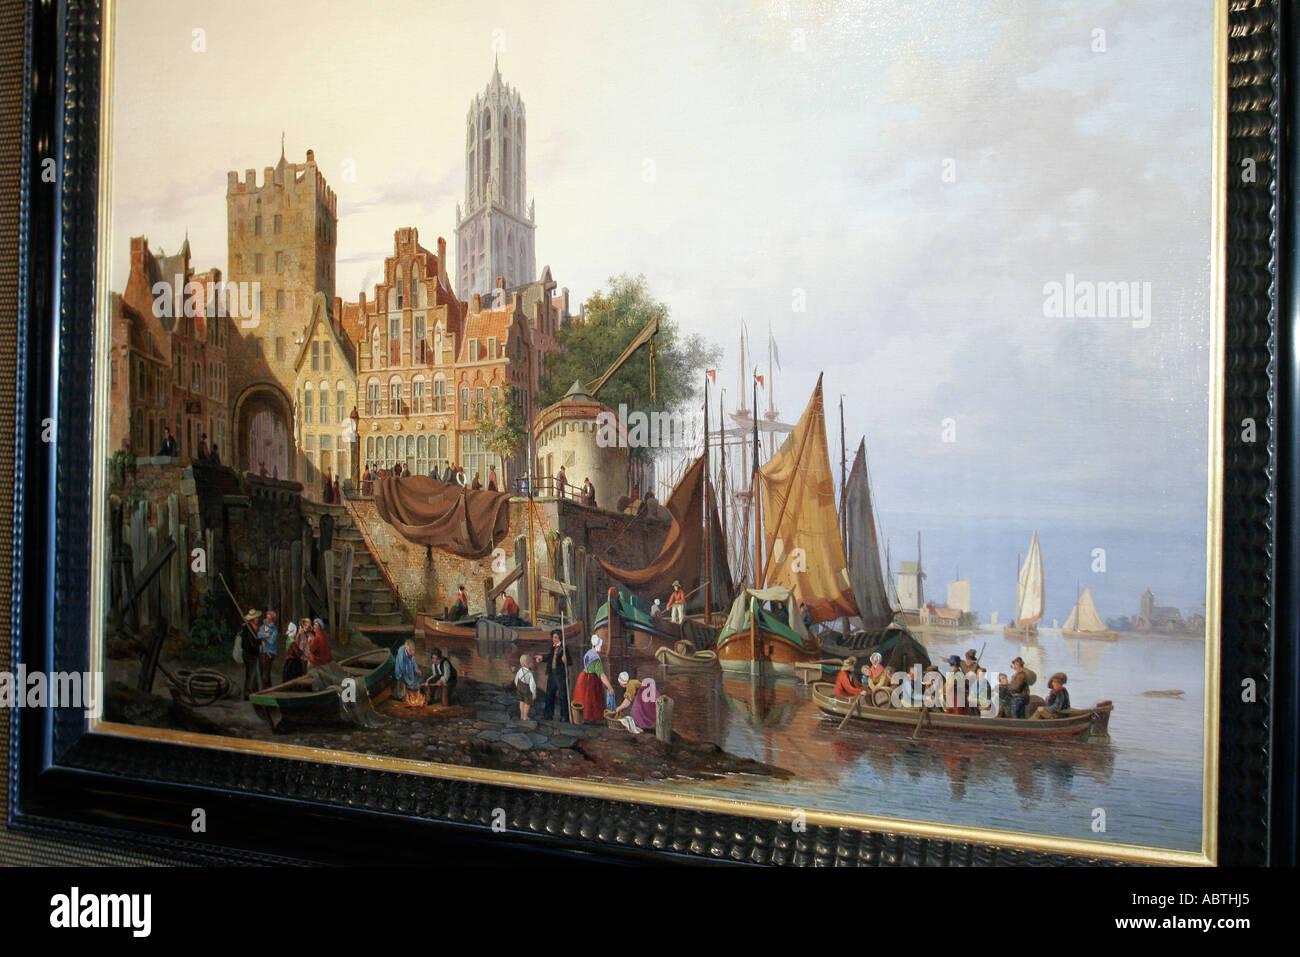 Fein Gerahmte Bild Kunst Galerie - Benutzerdefinierte Bilderrahmen ...